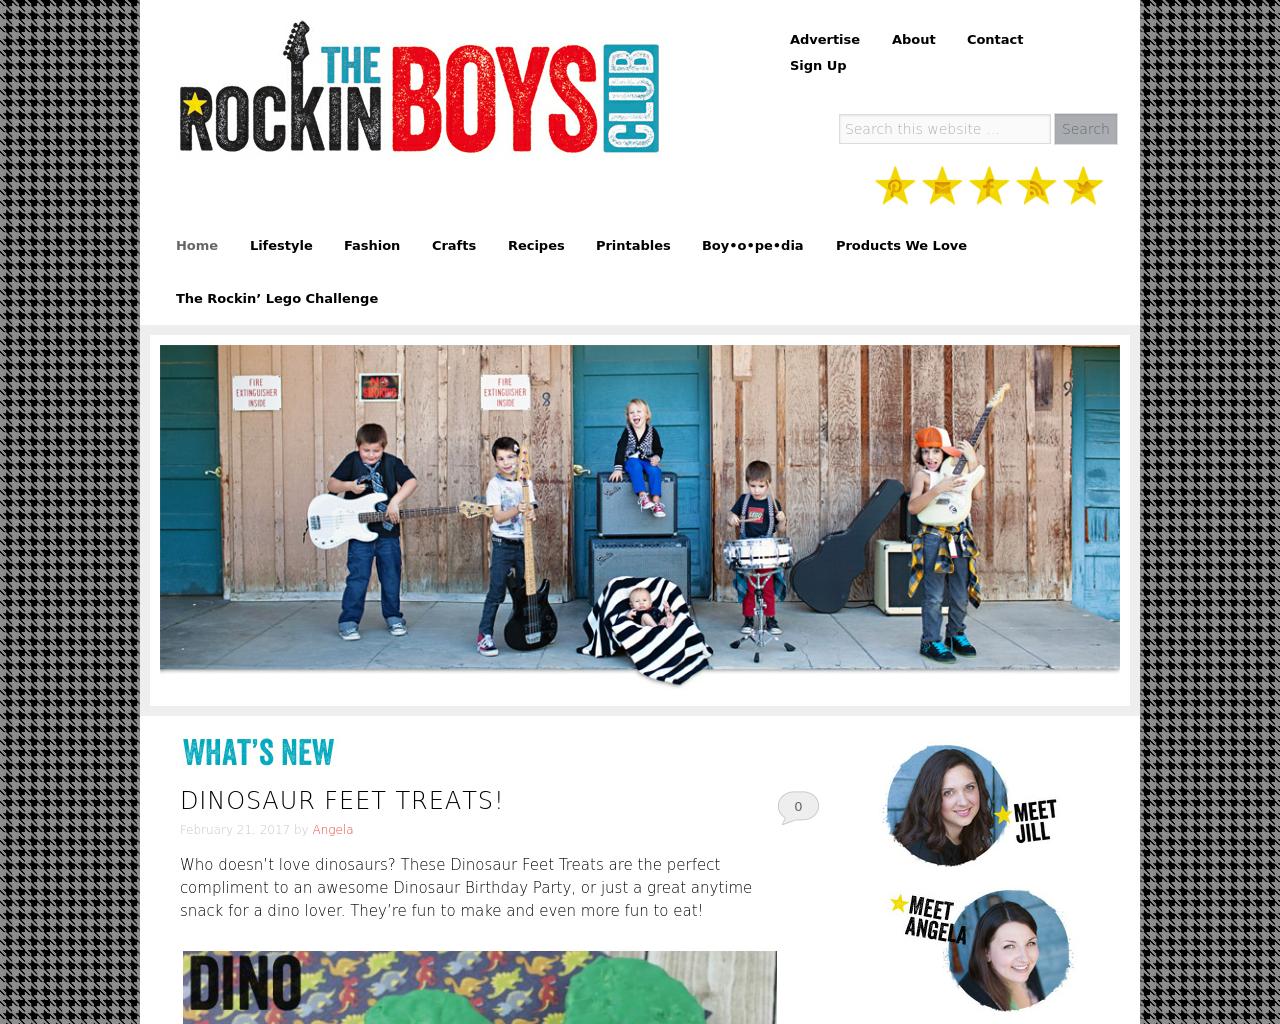 THE-ROCKIN-BOYS-CLUB-Advertising-Reviews-Pricing